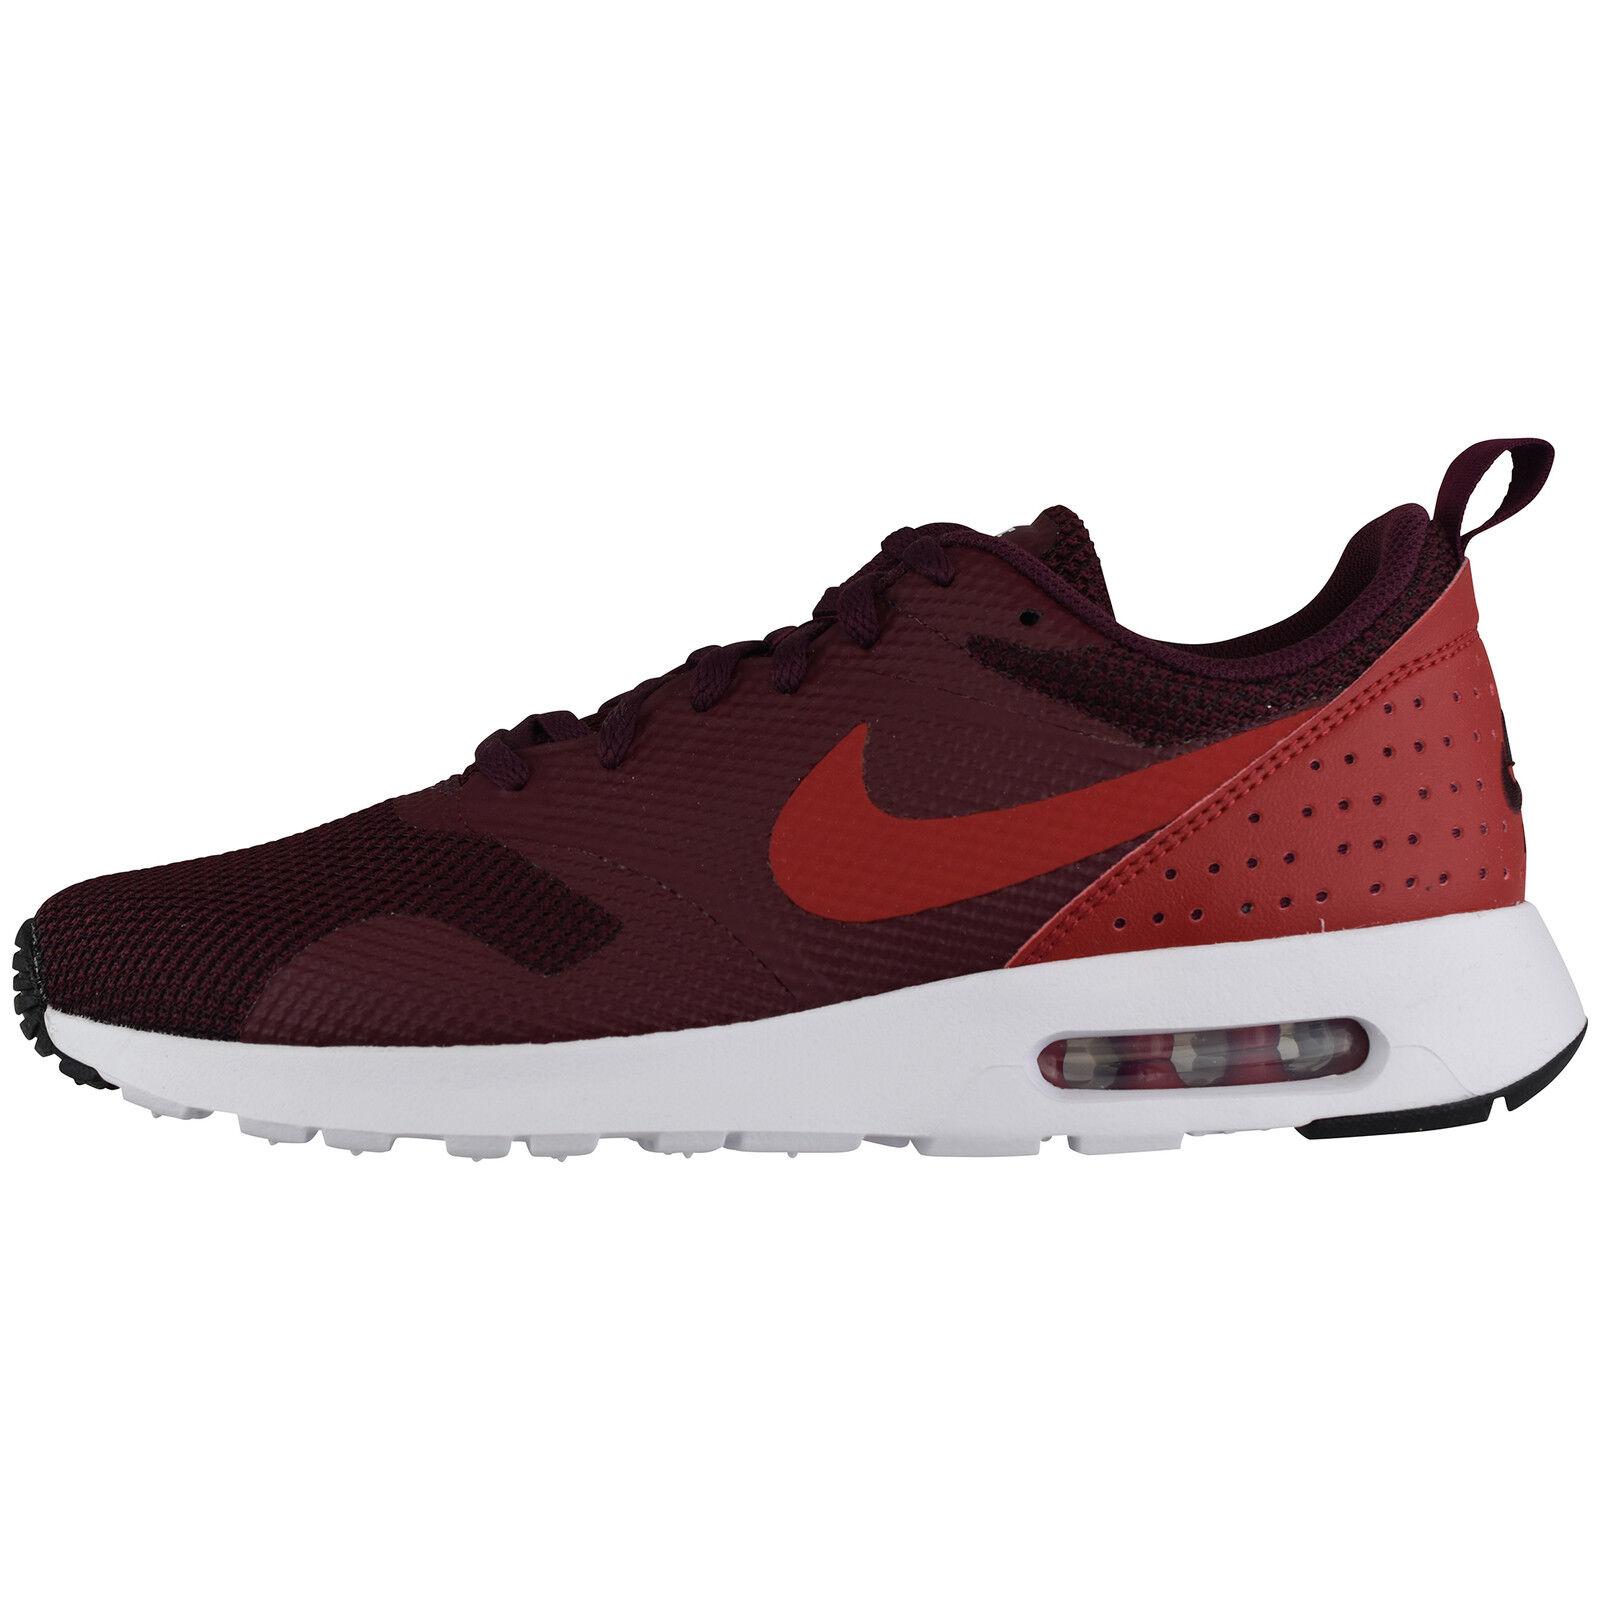 Nike Nike Nike Air Max Tavas Zapatos 705149-604 Classic Lifestyle Freizeit Schuh Sneaker 9f3f0d